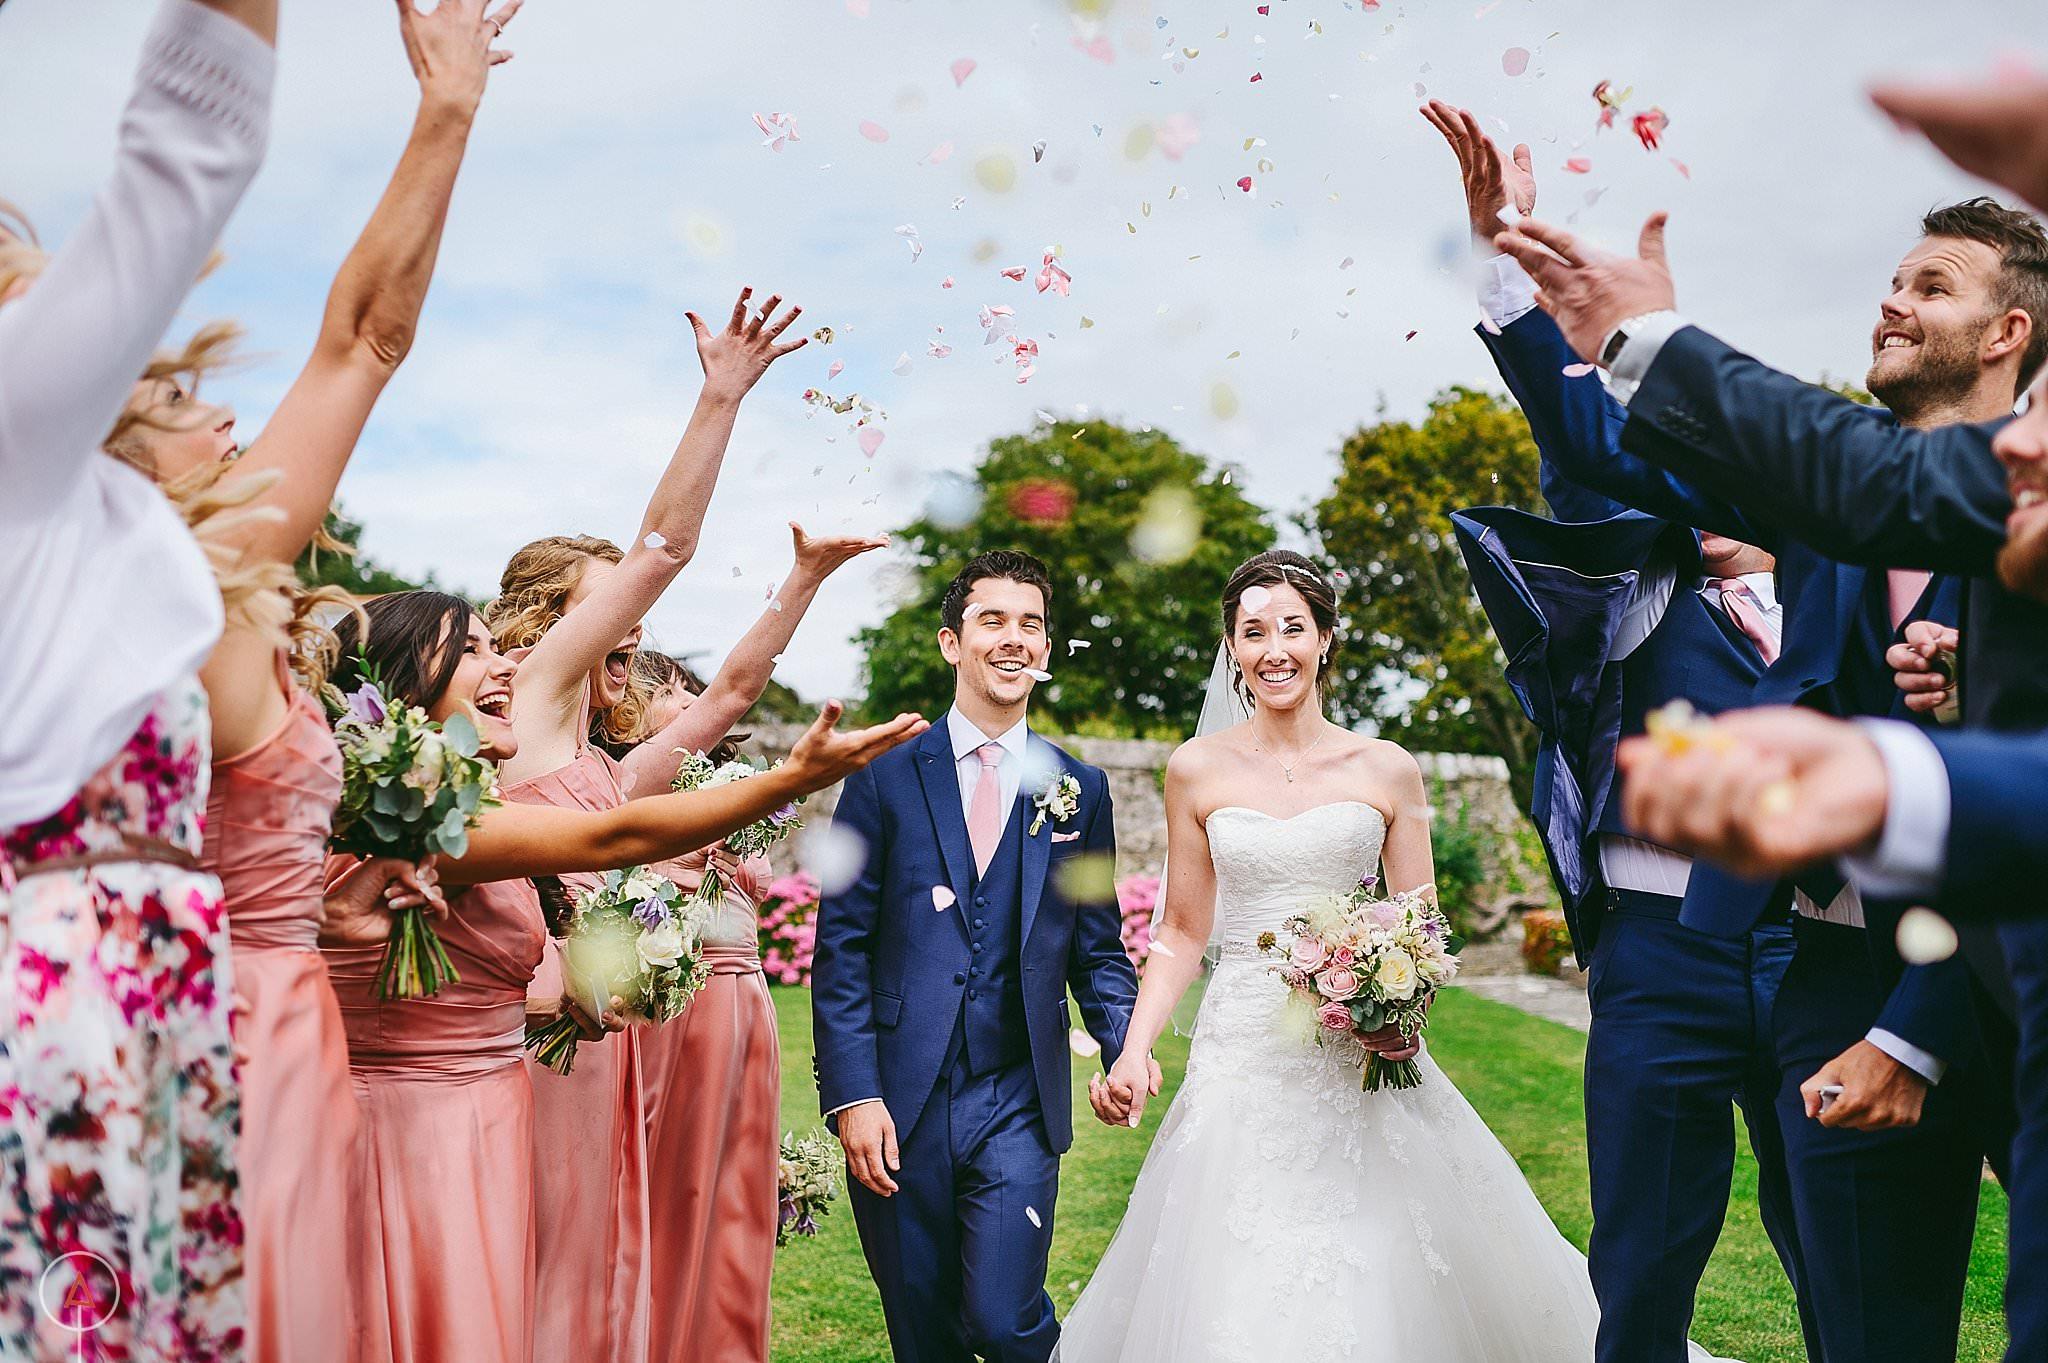 st-donats-llantwit-major-wedding-photography_0067